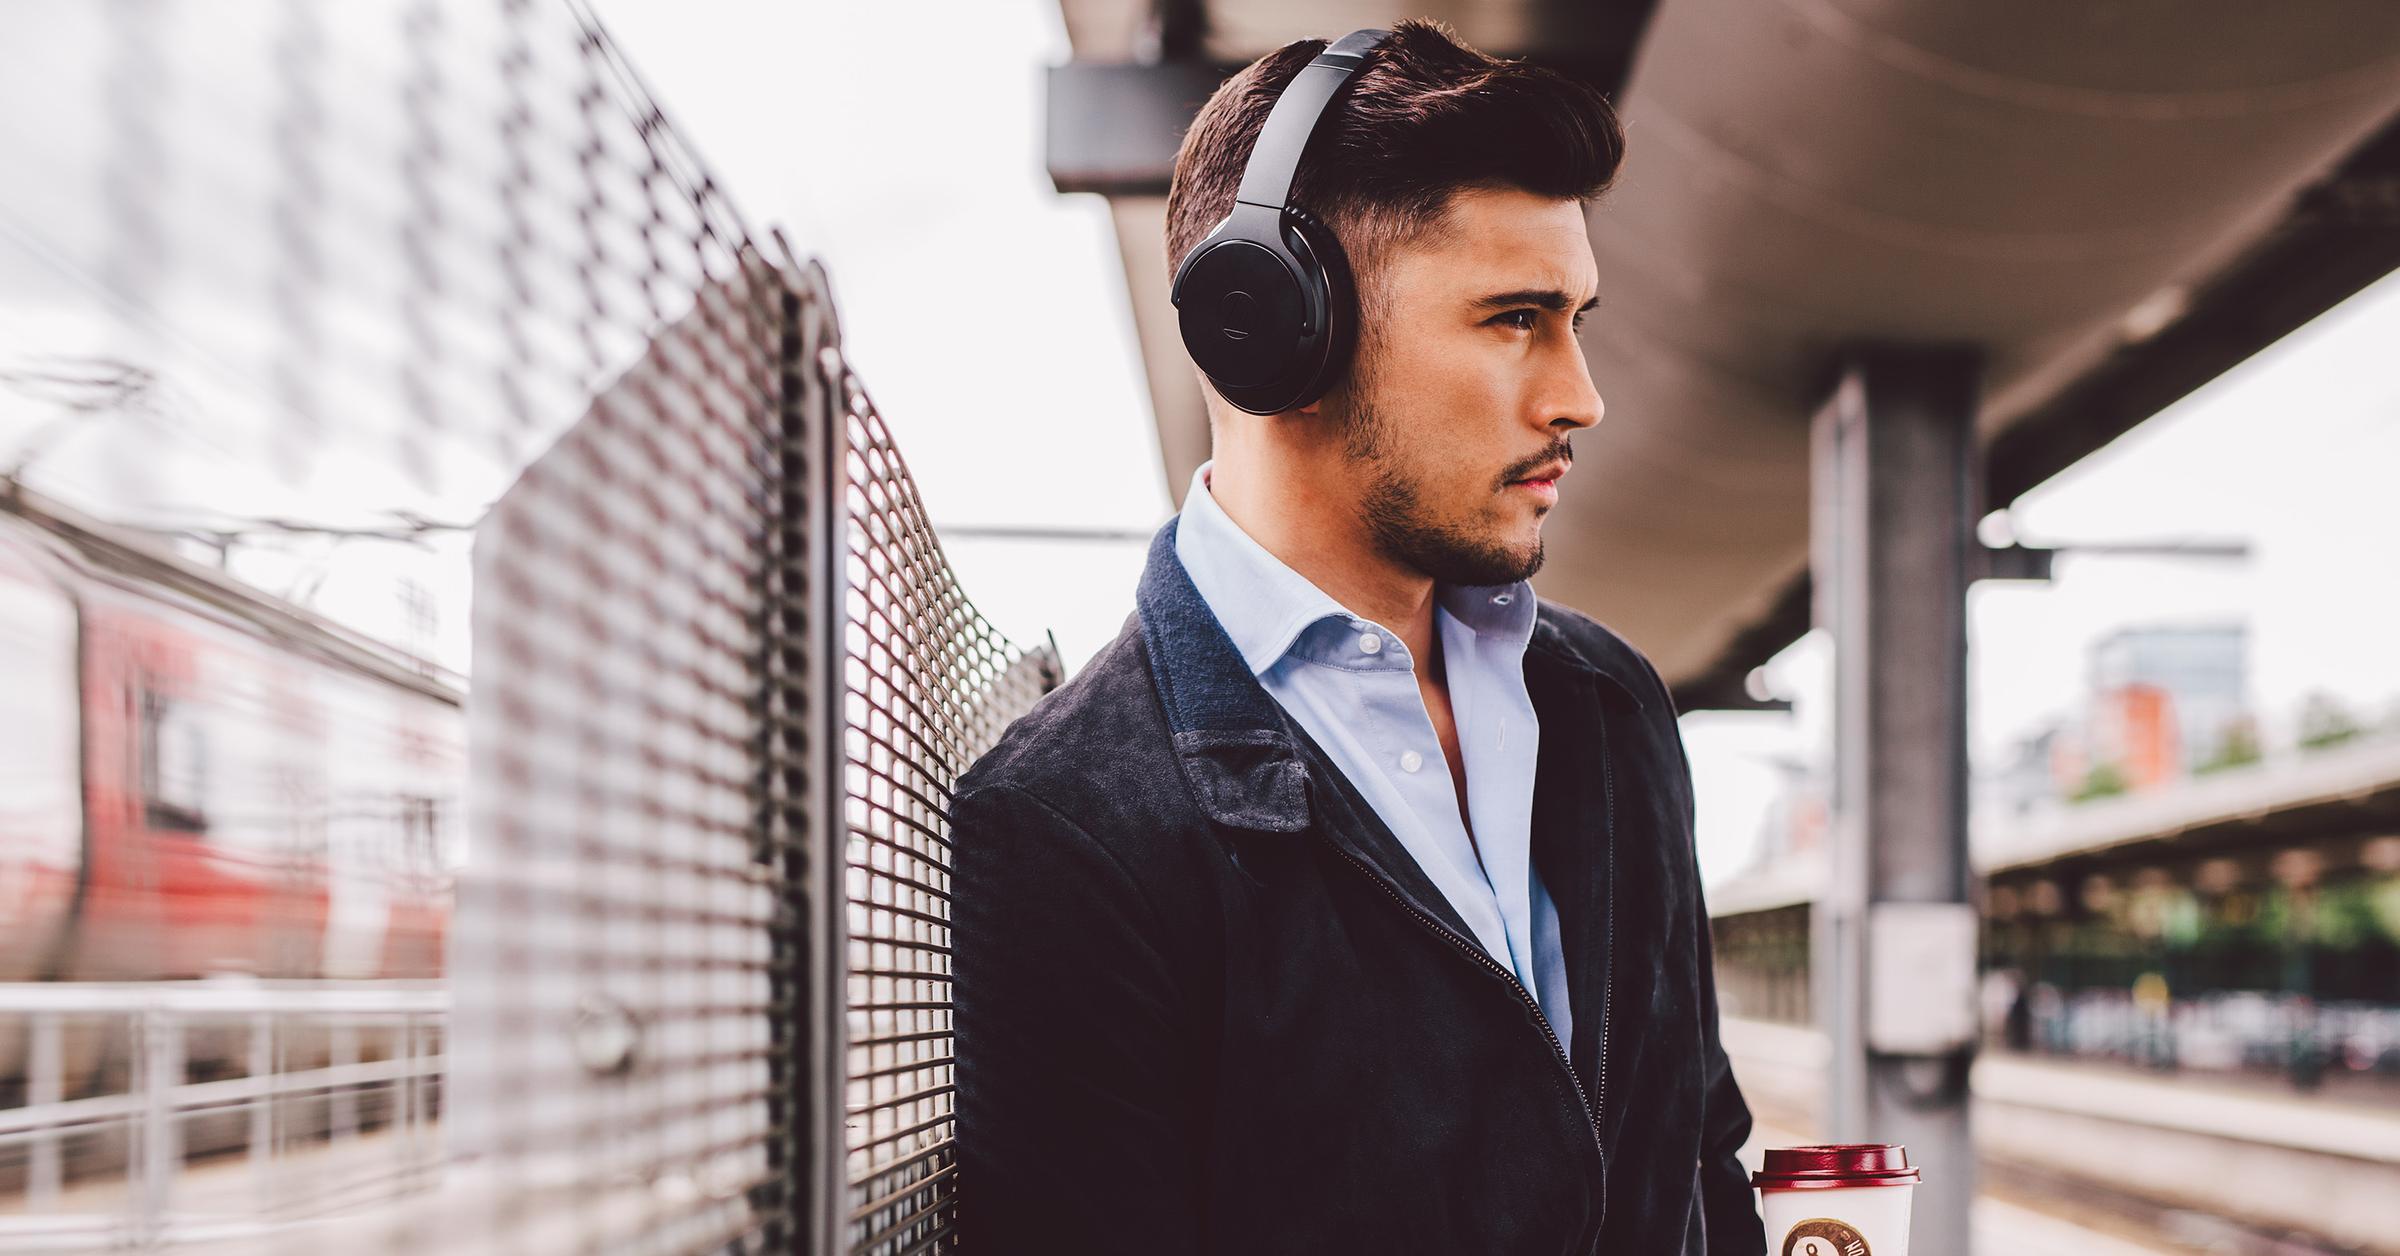 Microphone, Audio-Technica, CES, Audio Technica ATH-ANC900BT QuietPoint Wireless Active Noise-Cancelling Headphones, Headphones, Active noise control, Noise-cancelling headphones, Audio-Technica ATH-DSR7BT, Audio-Technica QuietPoint, Bose QuietComfort, audio technica ath anc900bt, Suit, White-collar worker, Audio equipment, Gentleman, Male, Ear, Formal wear, Fashion, Human, Headphones